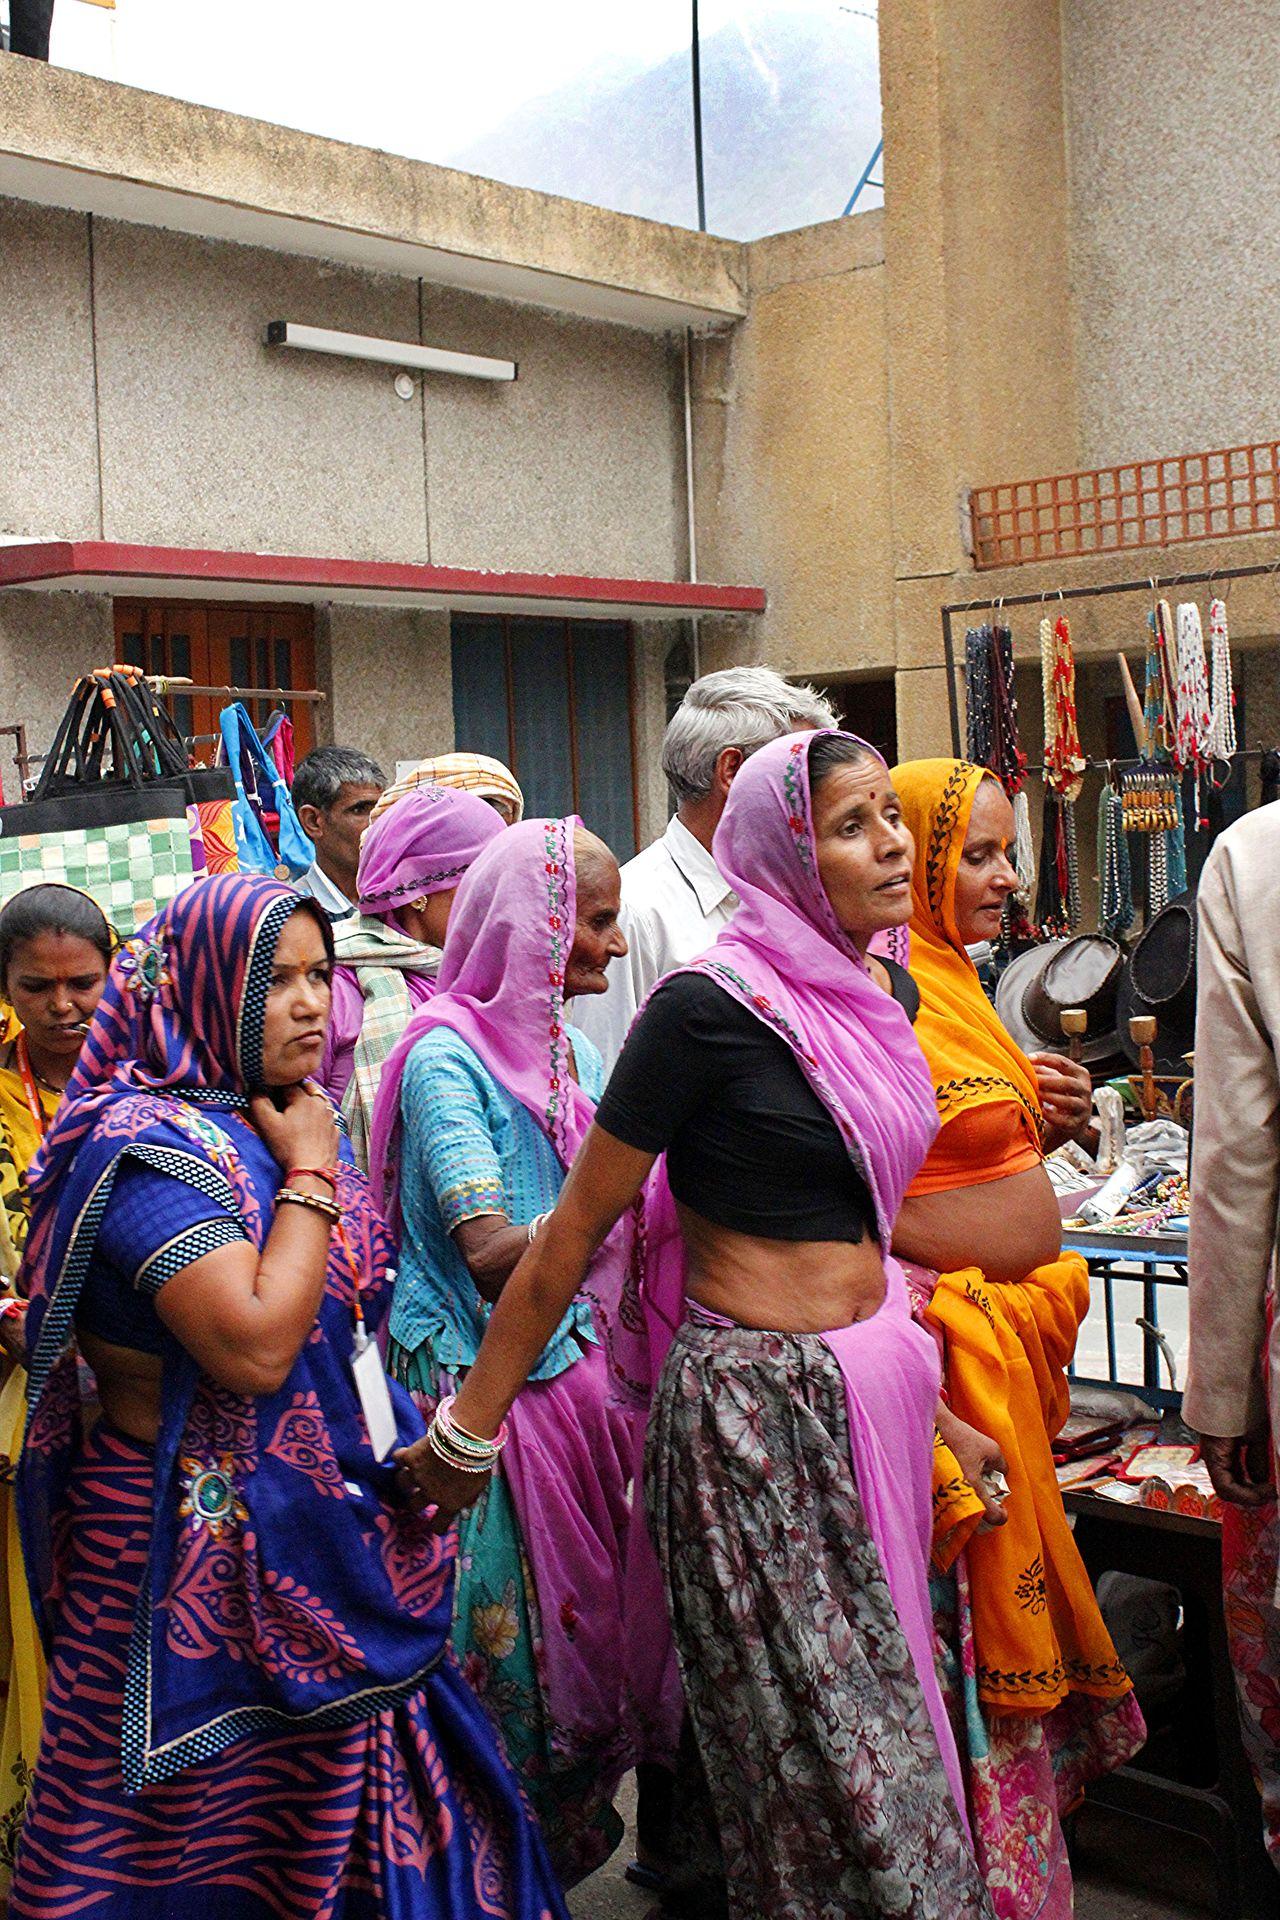 Indianwomen Sari Selfconfidence Strongwoman Wearingasari Women Womenofindia Womenrights